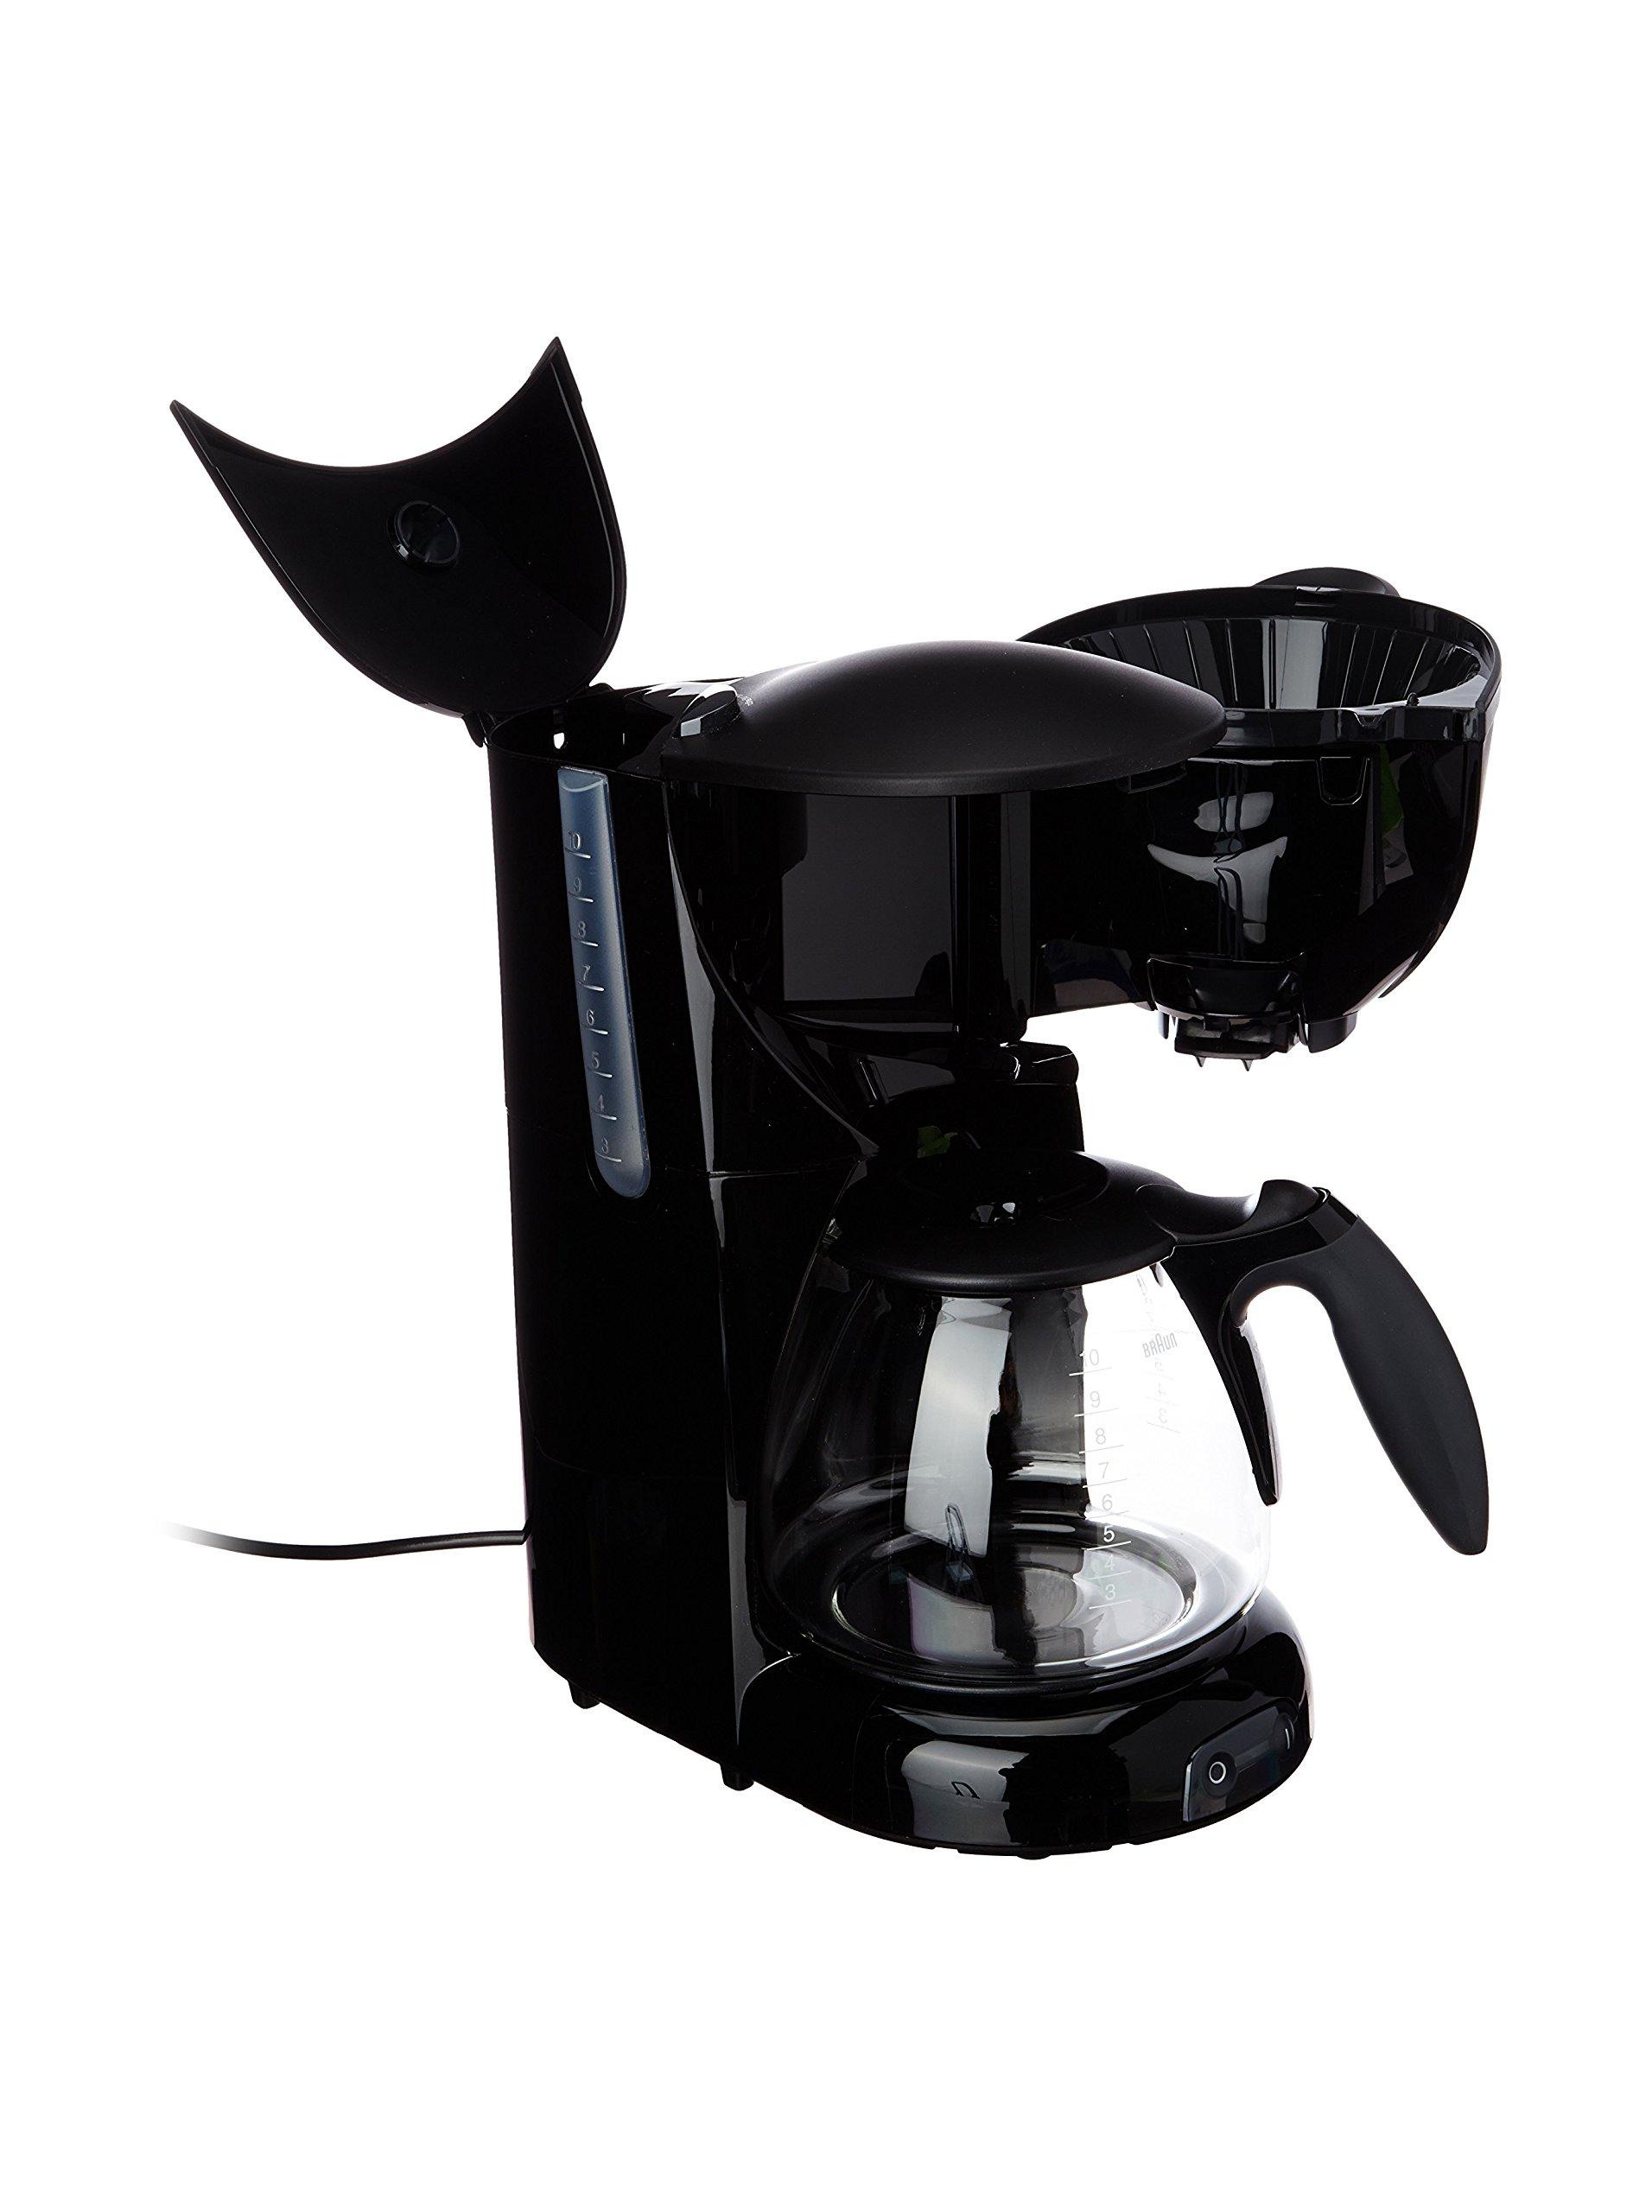 Braun-KF-5201-Filterkaffeemaschine